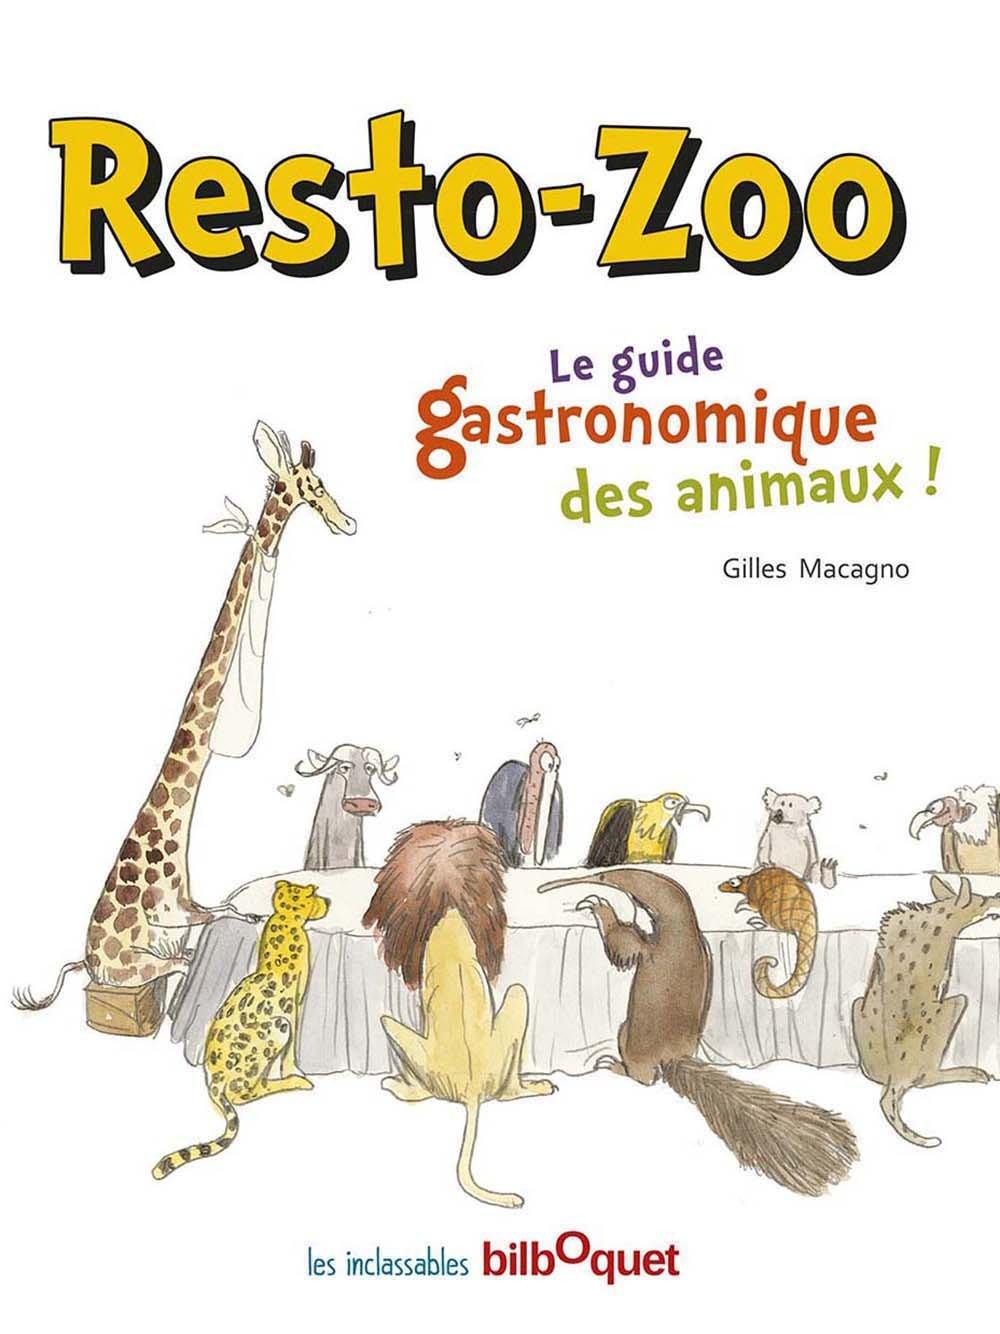 Le guide big mamma des restos en italie (cuisine) (french edition.